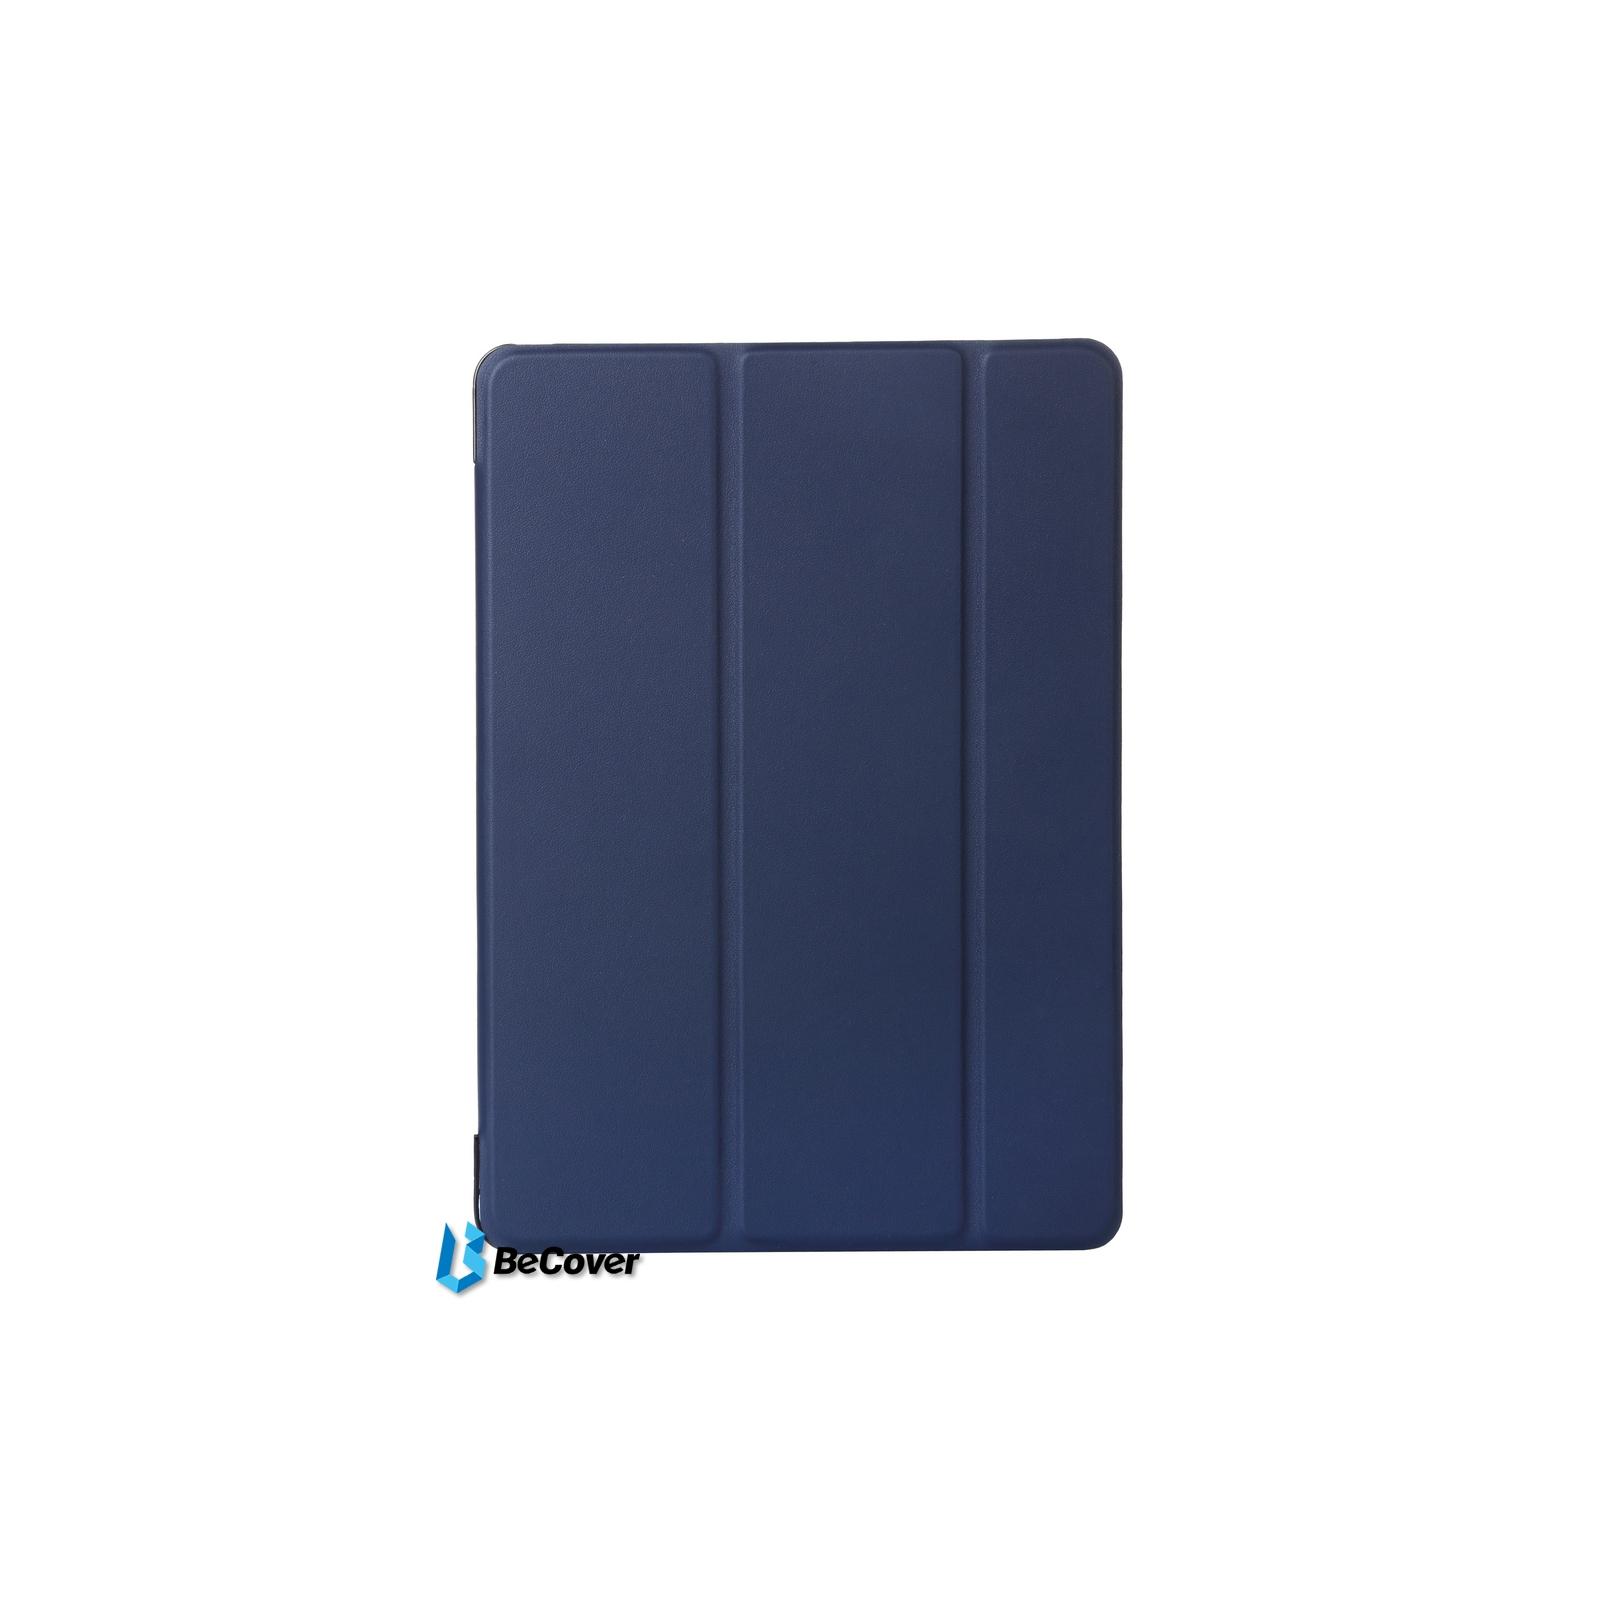 Чехол для планшета BeCover Pencil для Apple iPad 10.2 2019/2020 Deep Blue (704146)